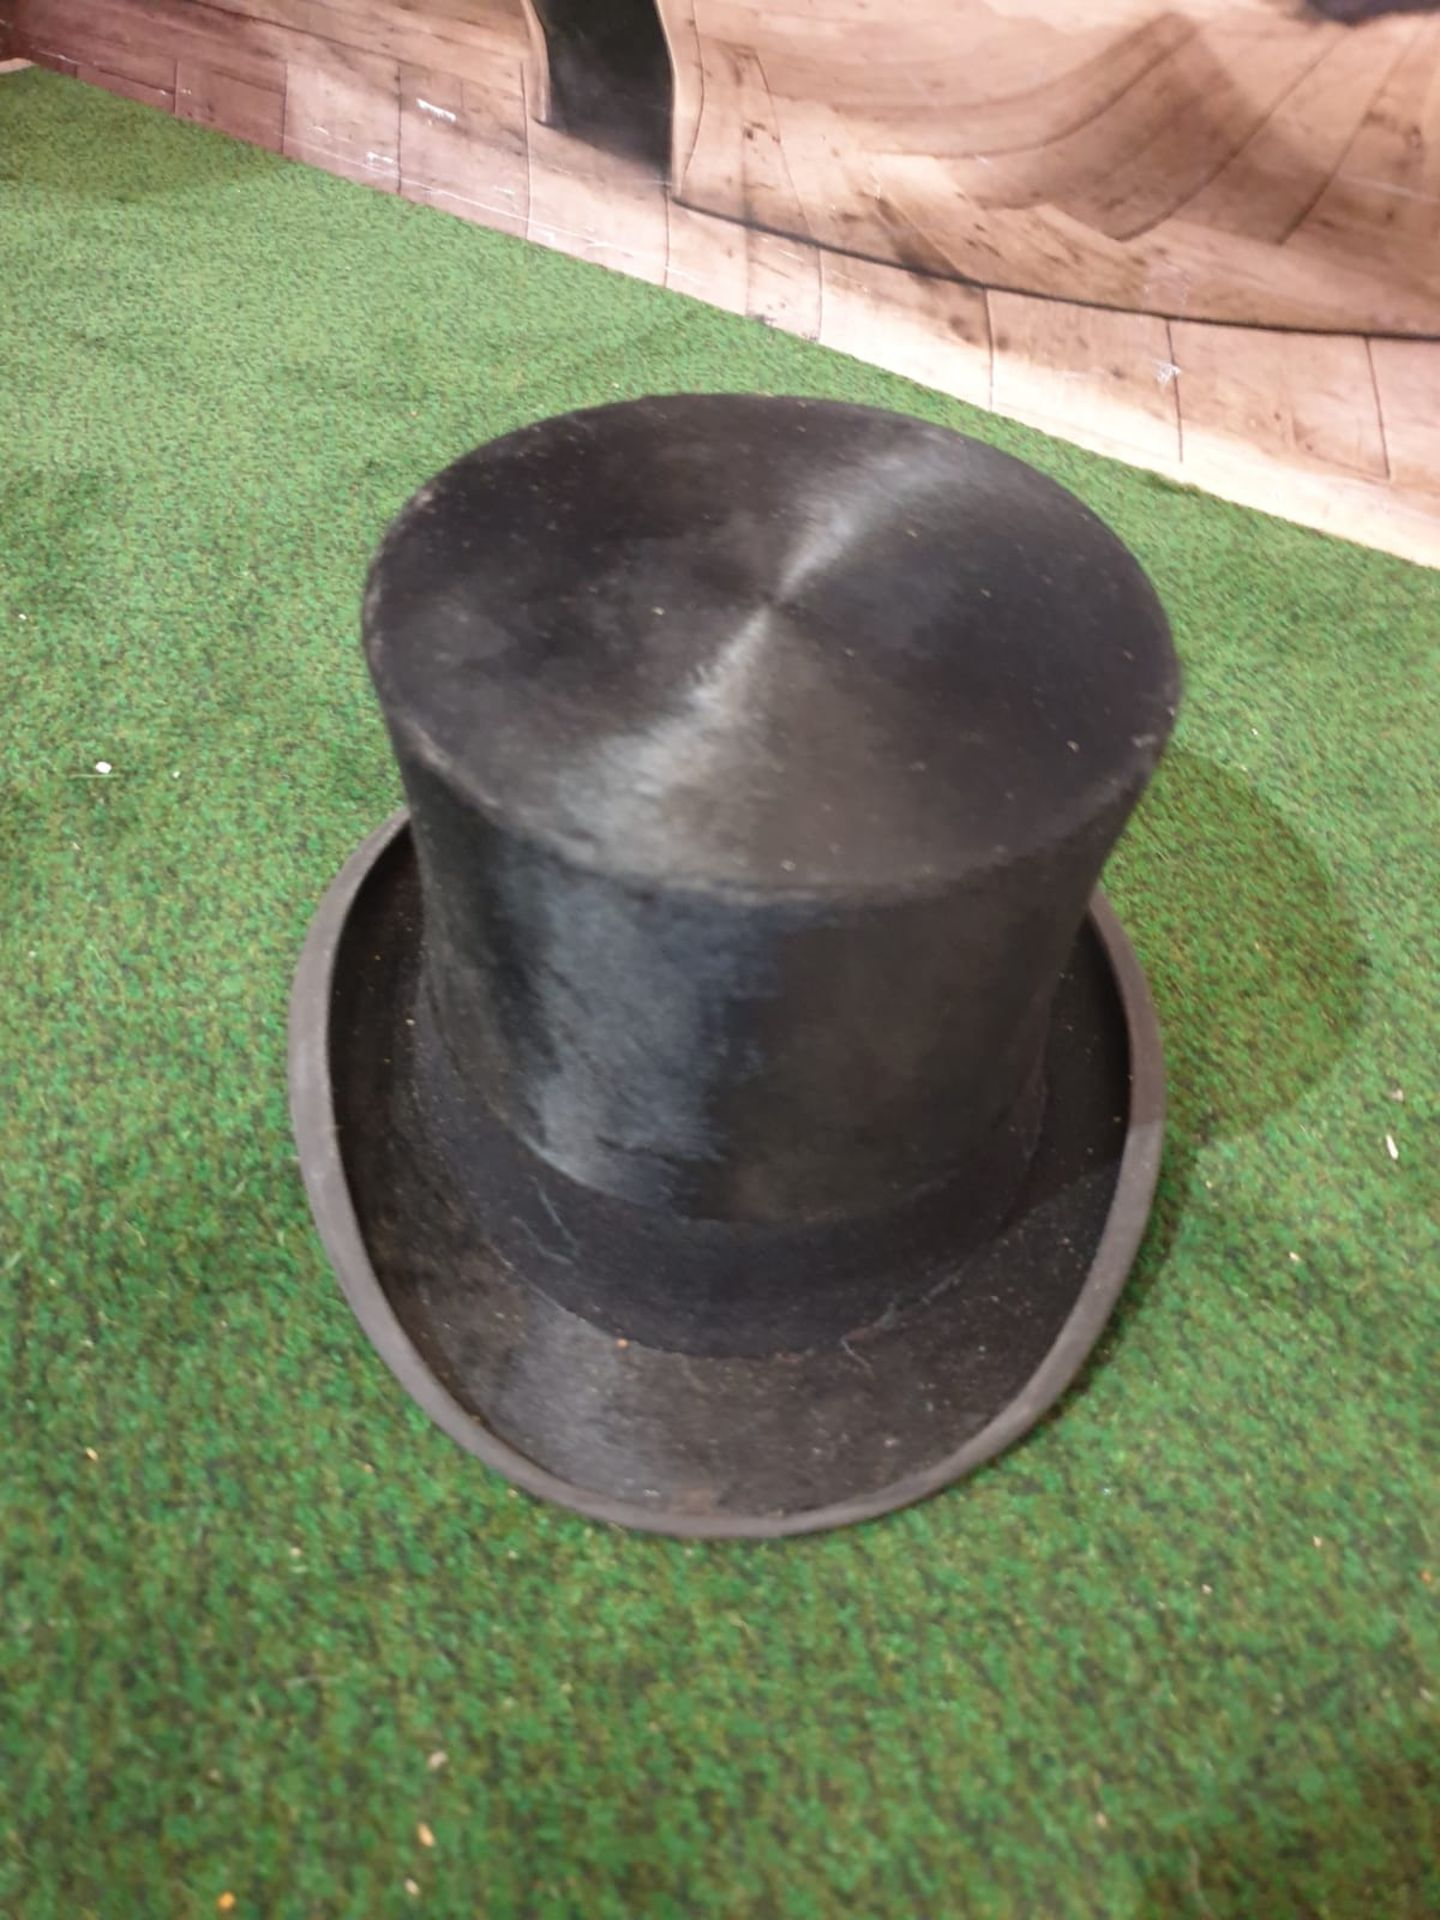 A James Lock + Co. Silk Black Top hat in a Waltar Barnhard card box